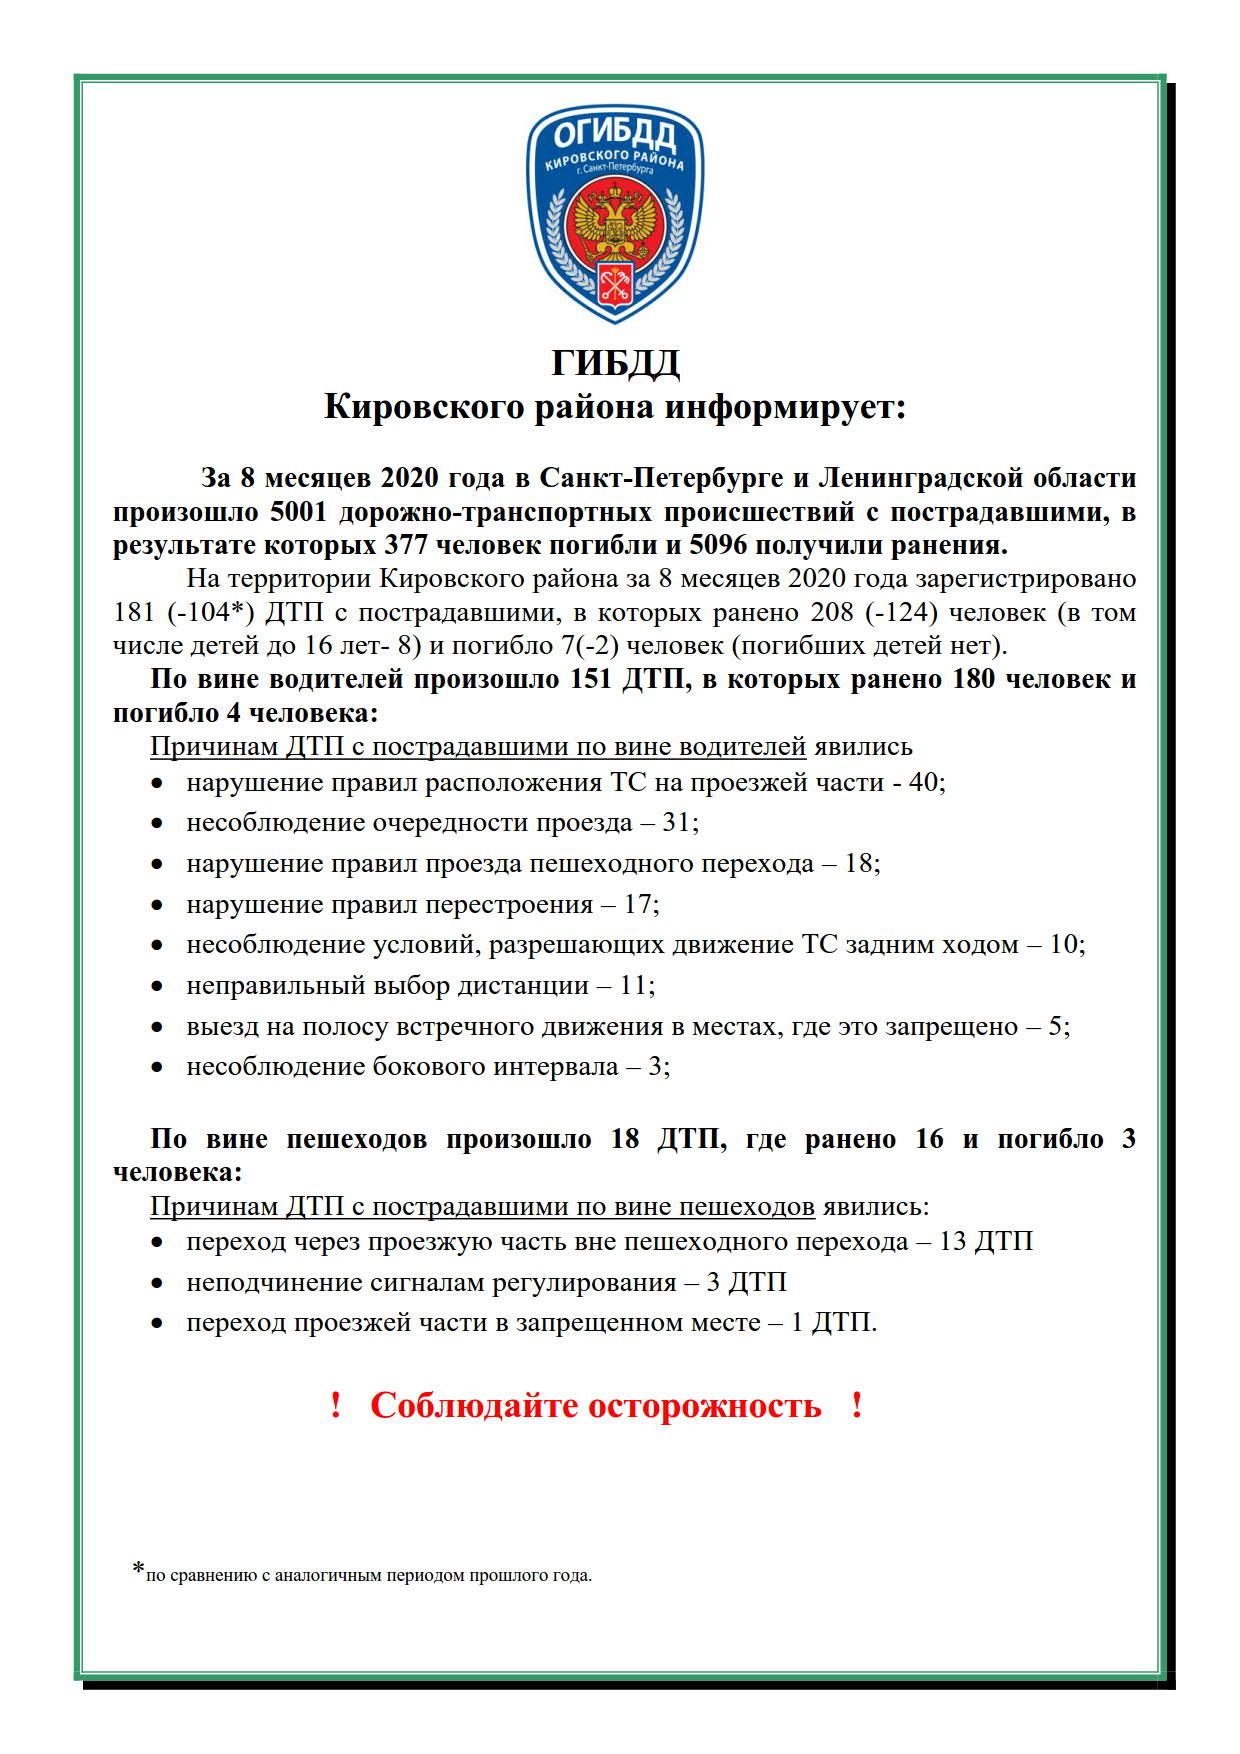 листовка ДТП 8 мес 2020_1